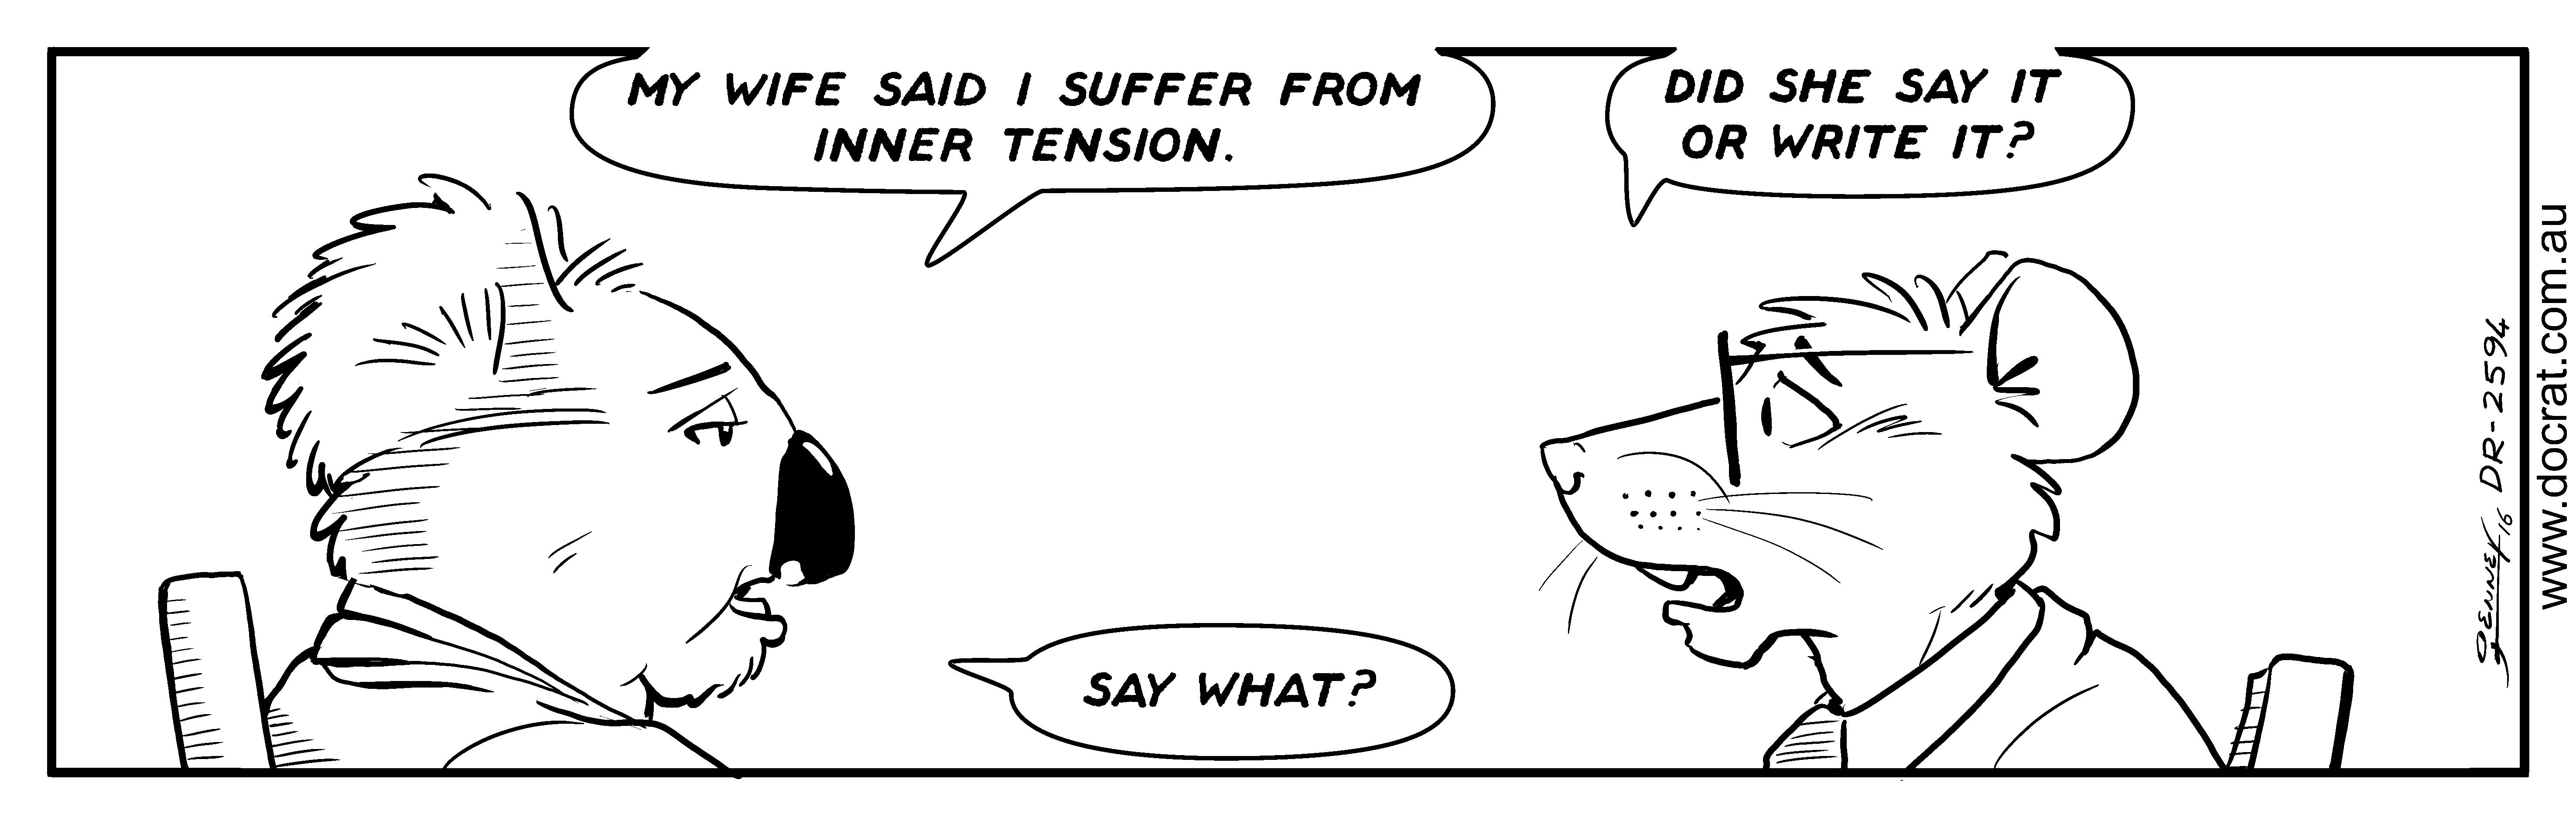 20160818